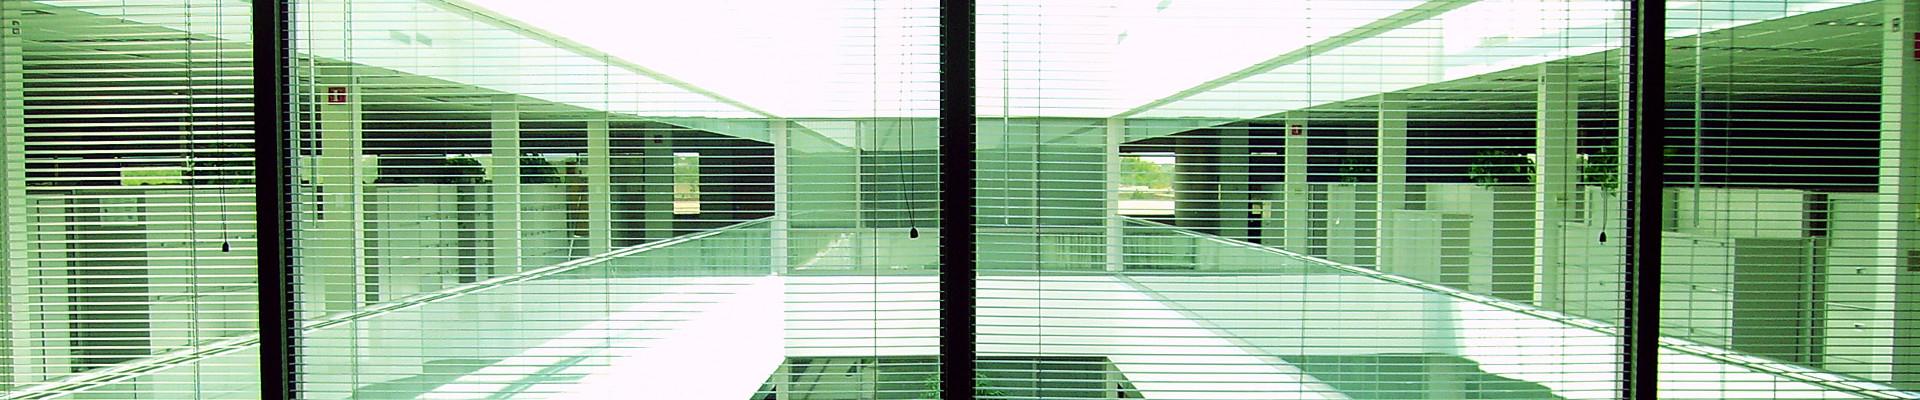 veneziane-ufficio